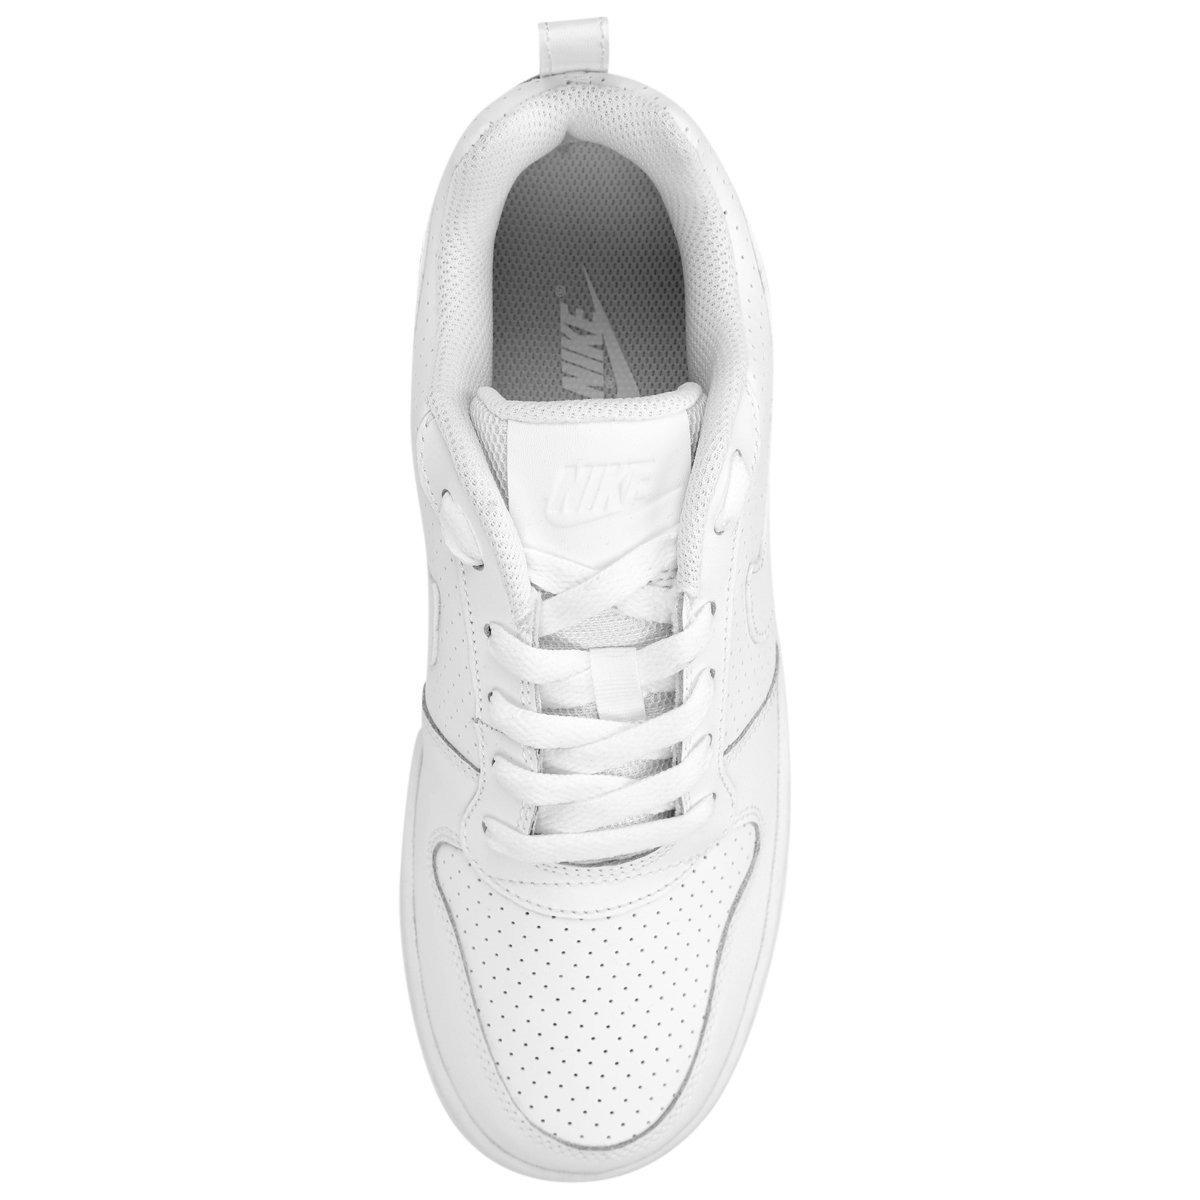 Blanco Nike Recreation Low Talle Zapatillas 38 j4RAL5